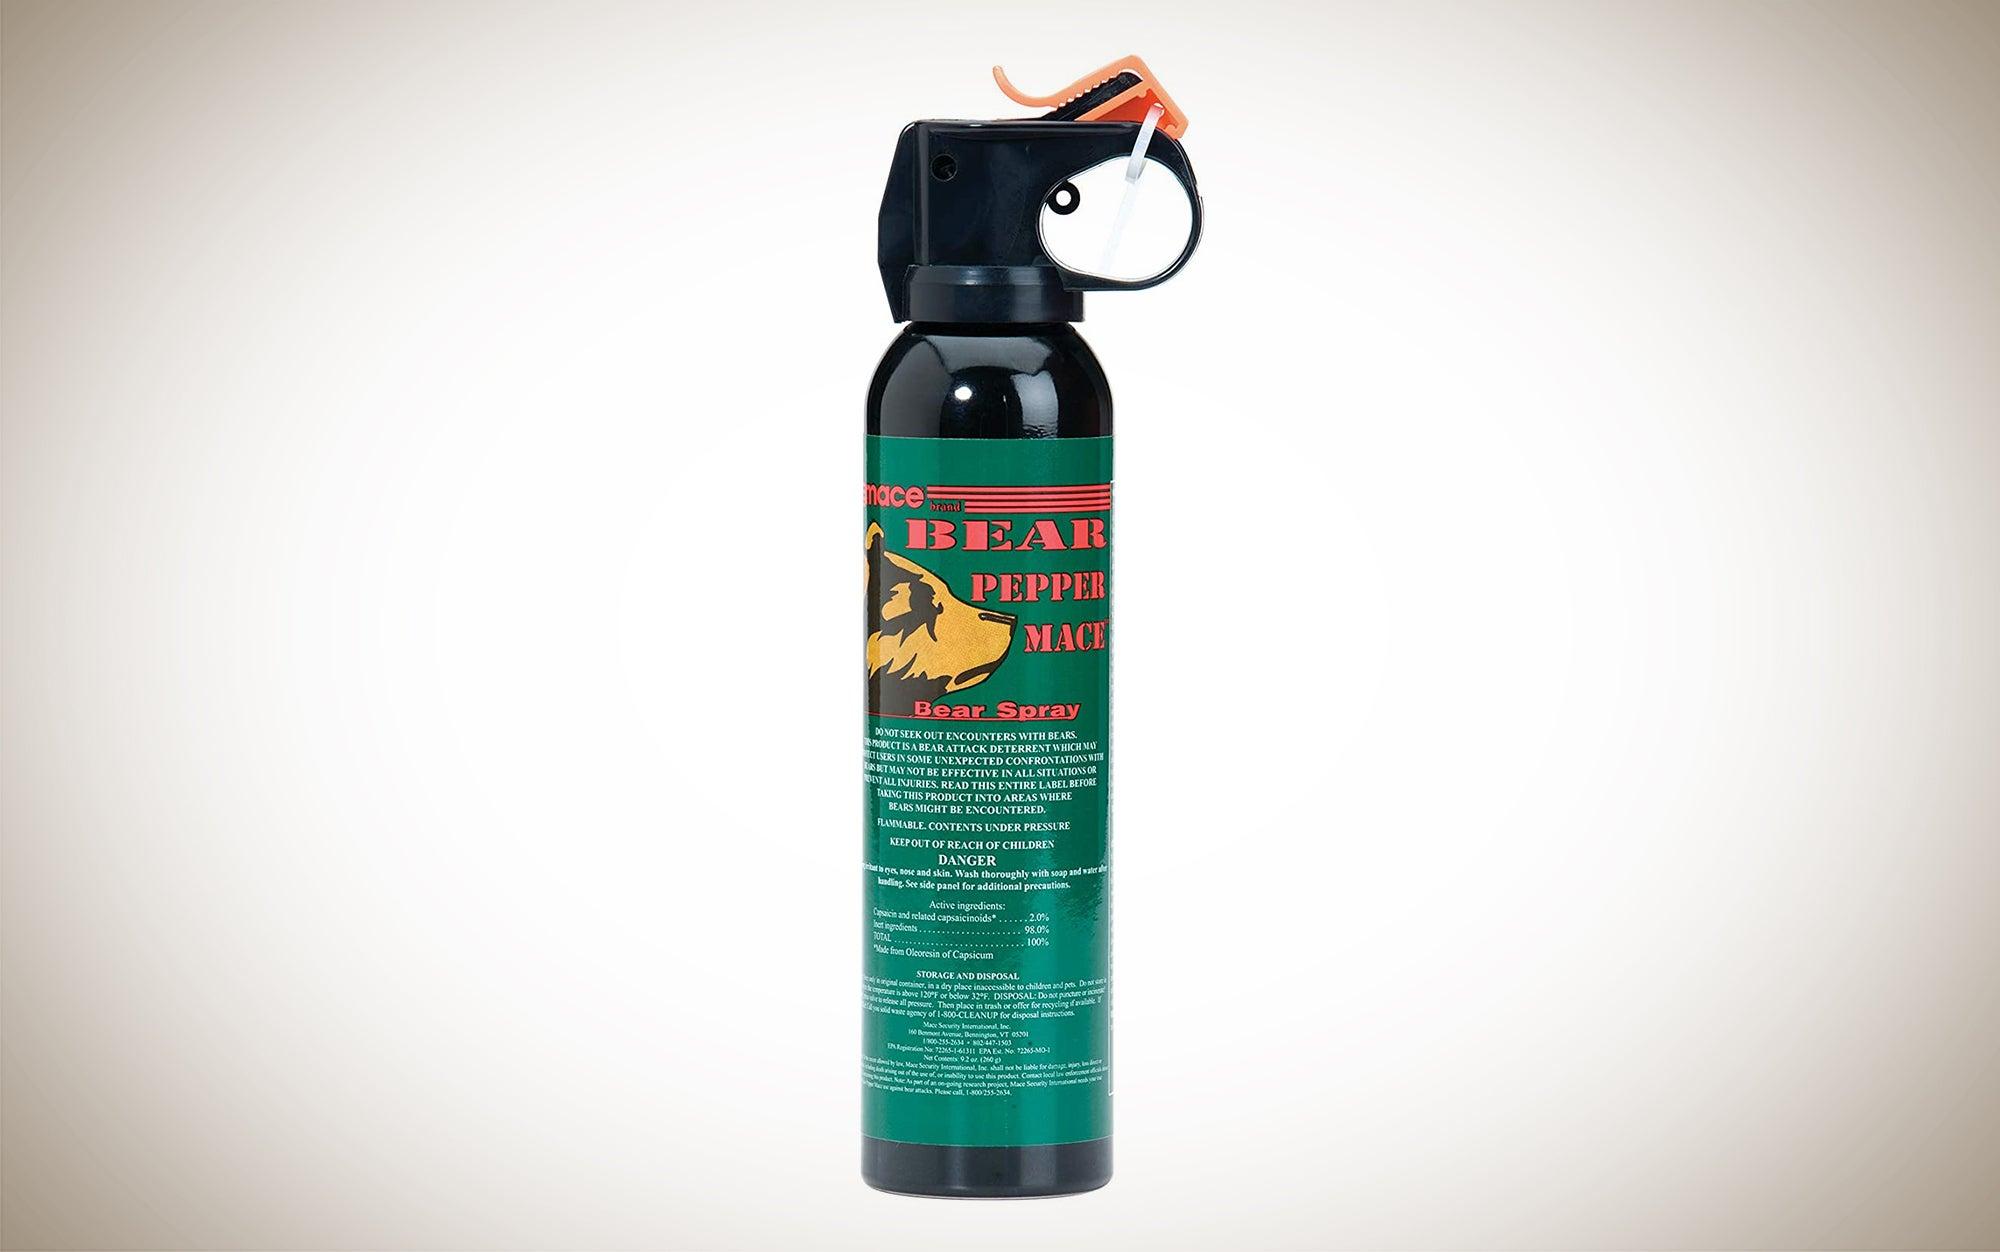 Mace Bear Spray is a bear pepper spray that sprays up to 35 feet away.